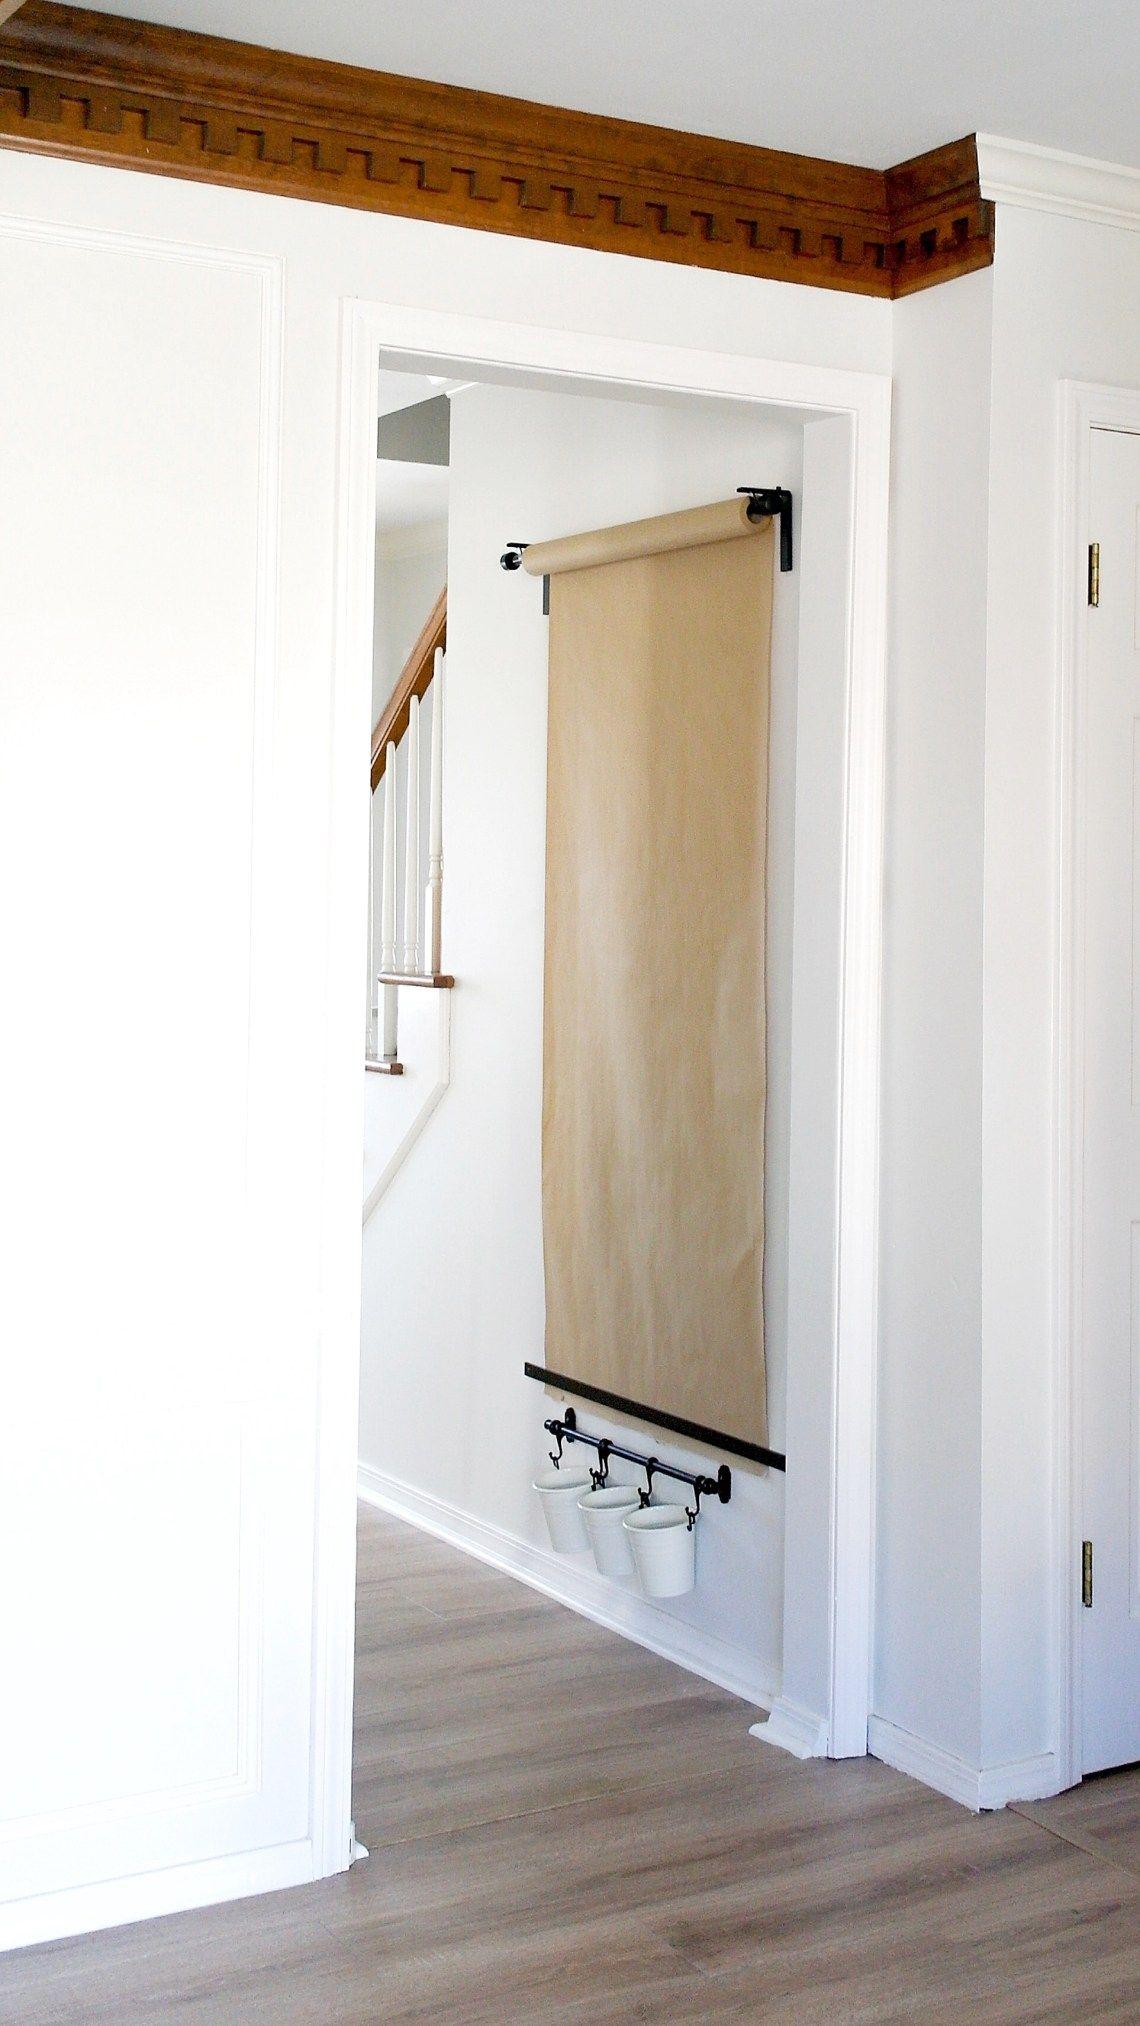 25 DIY Home Decor Ideas